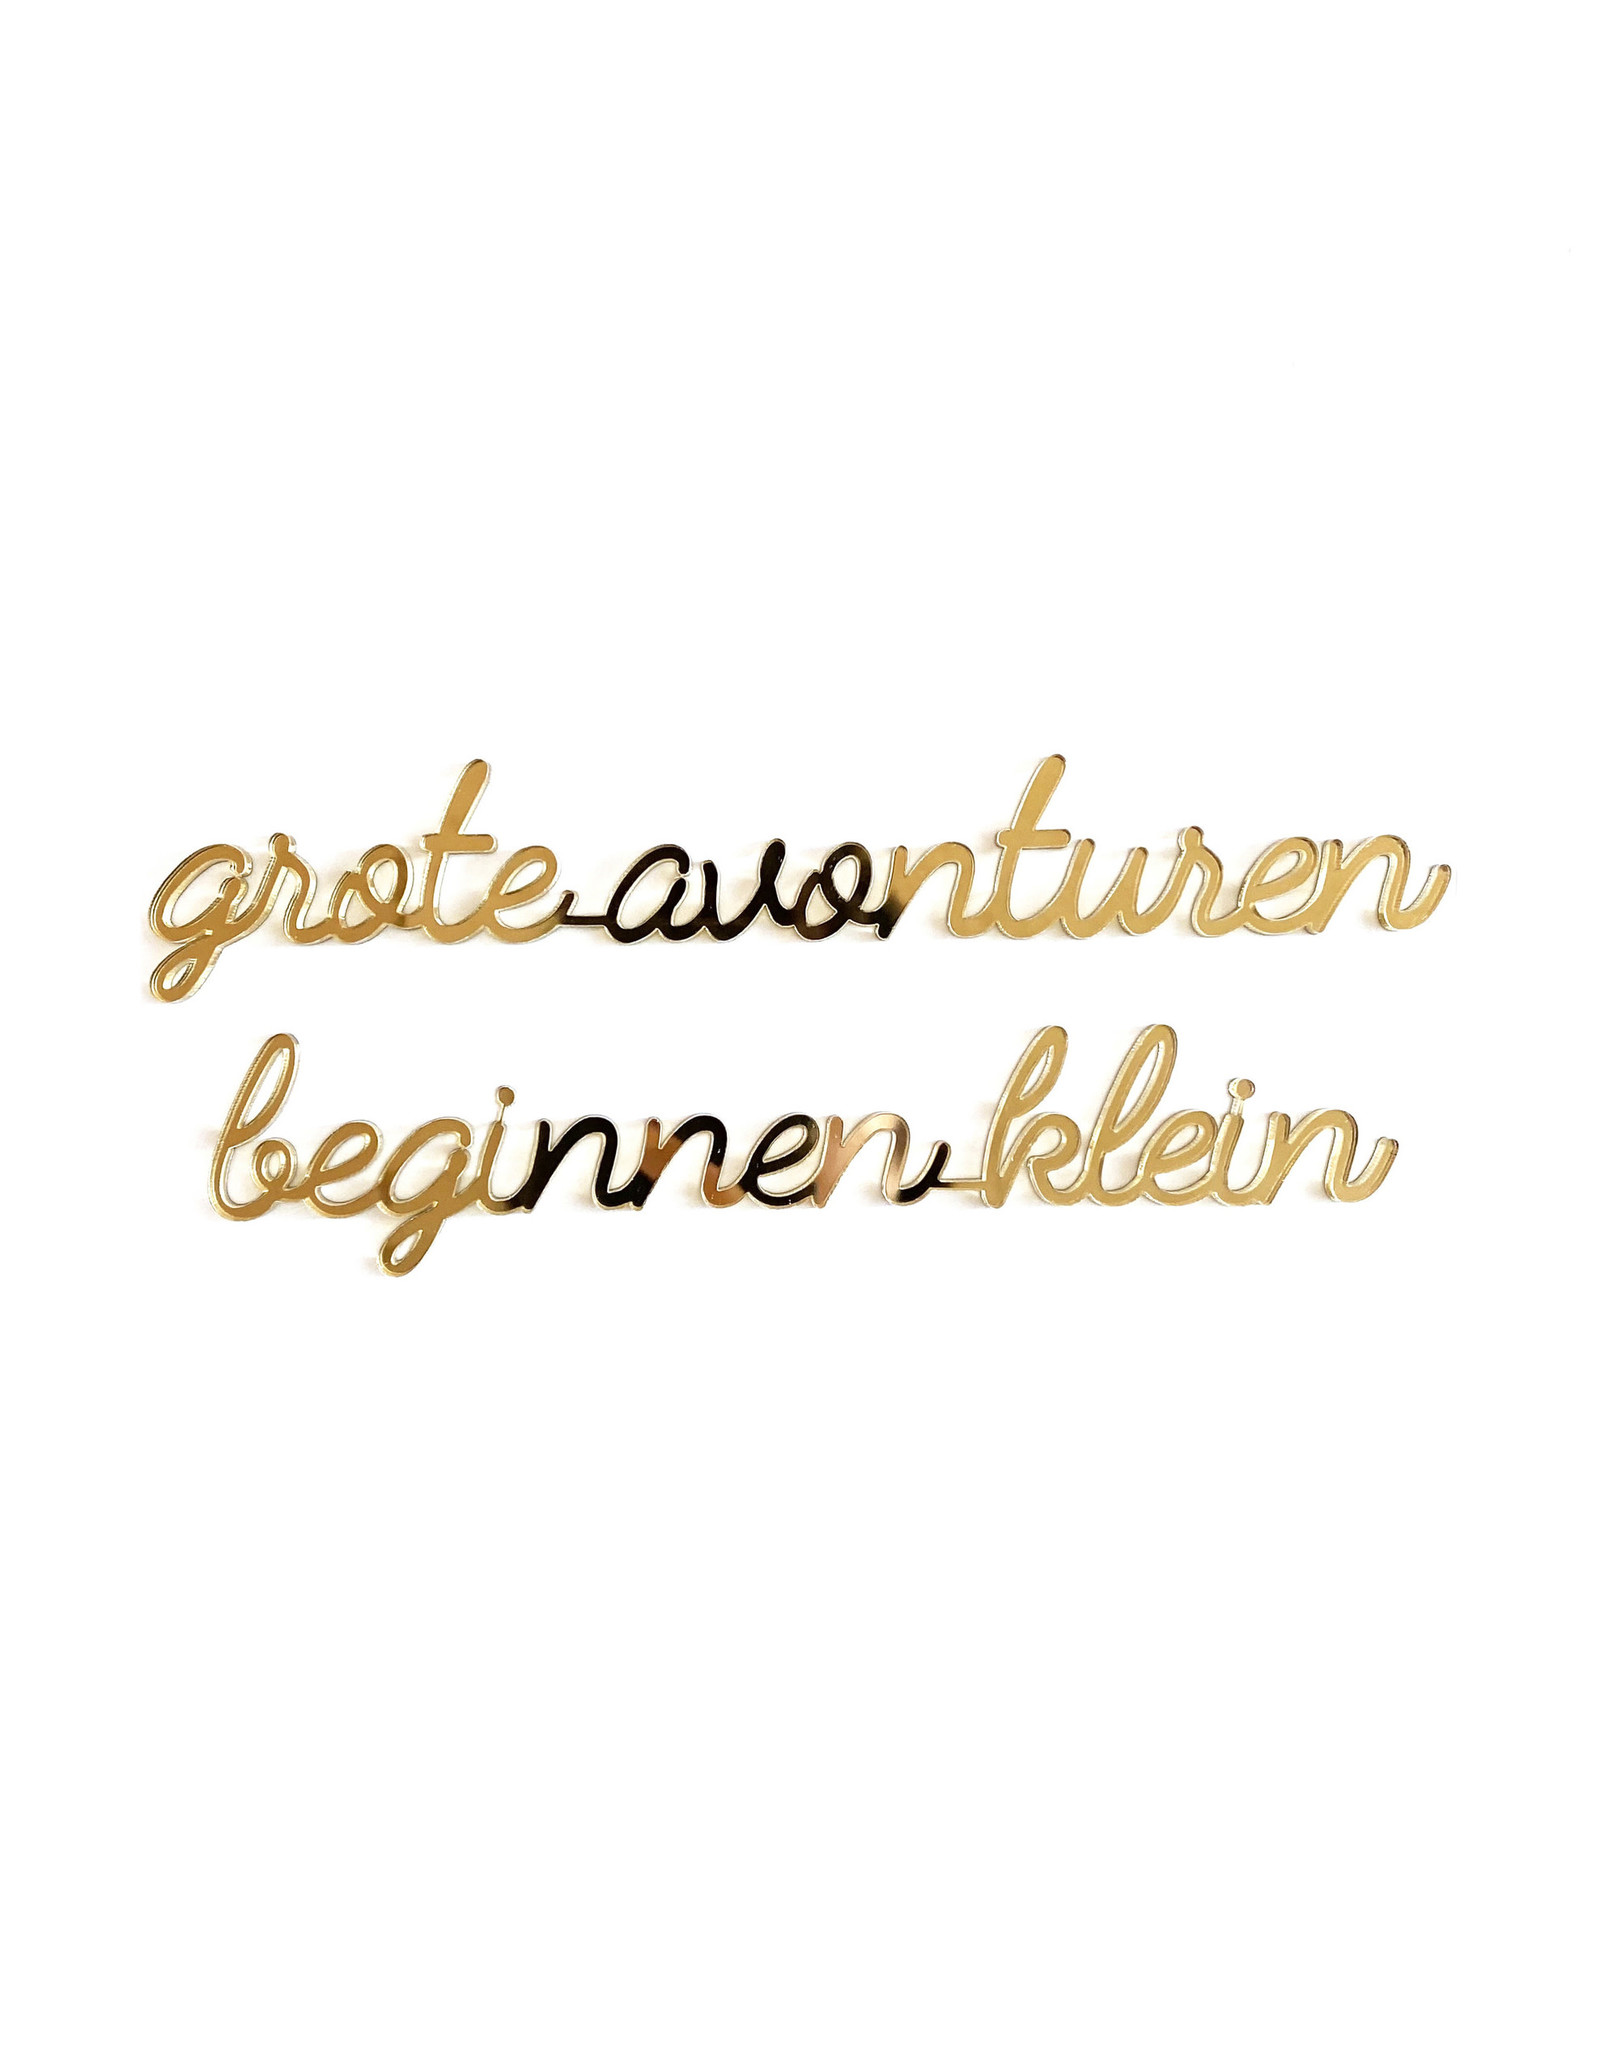 Quote 'grote avonturen beginnen klein' goud